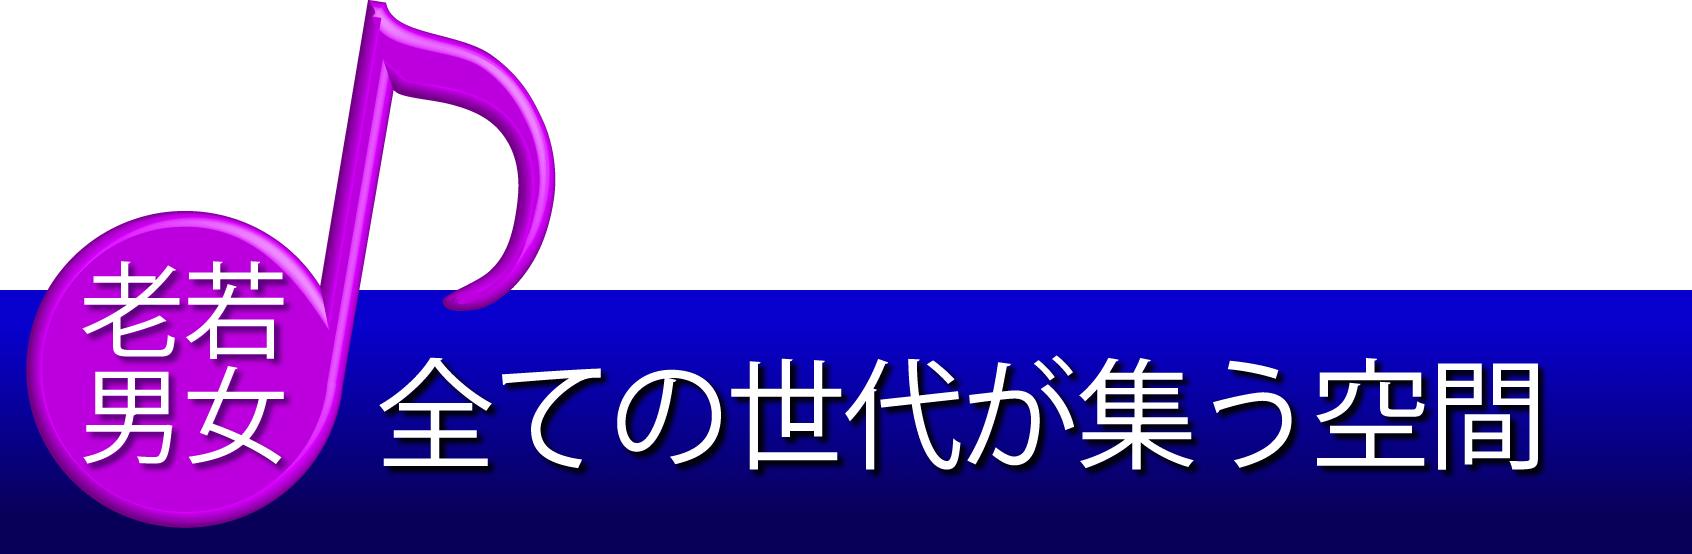 banner_HP-basic01_05_all@2x